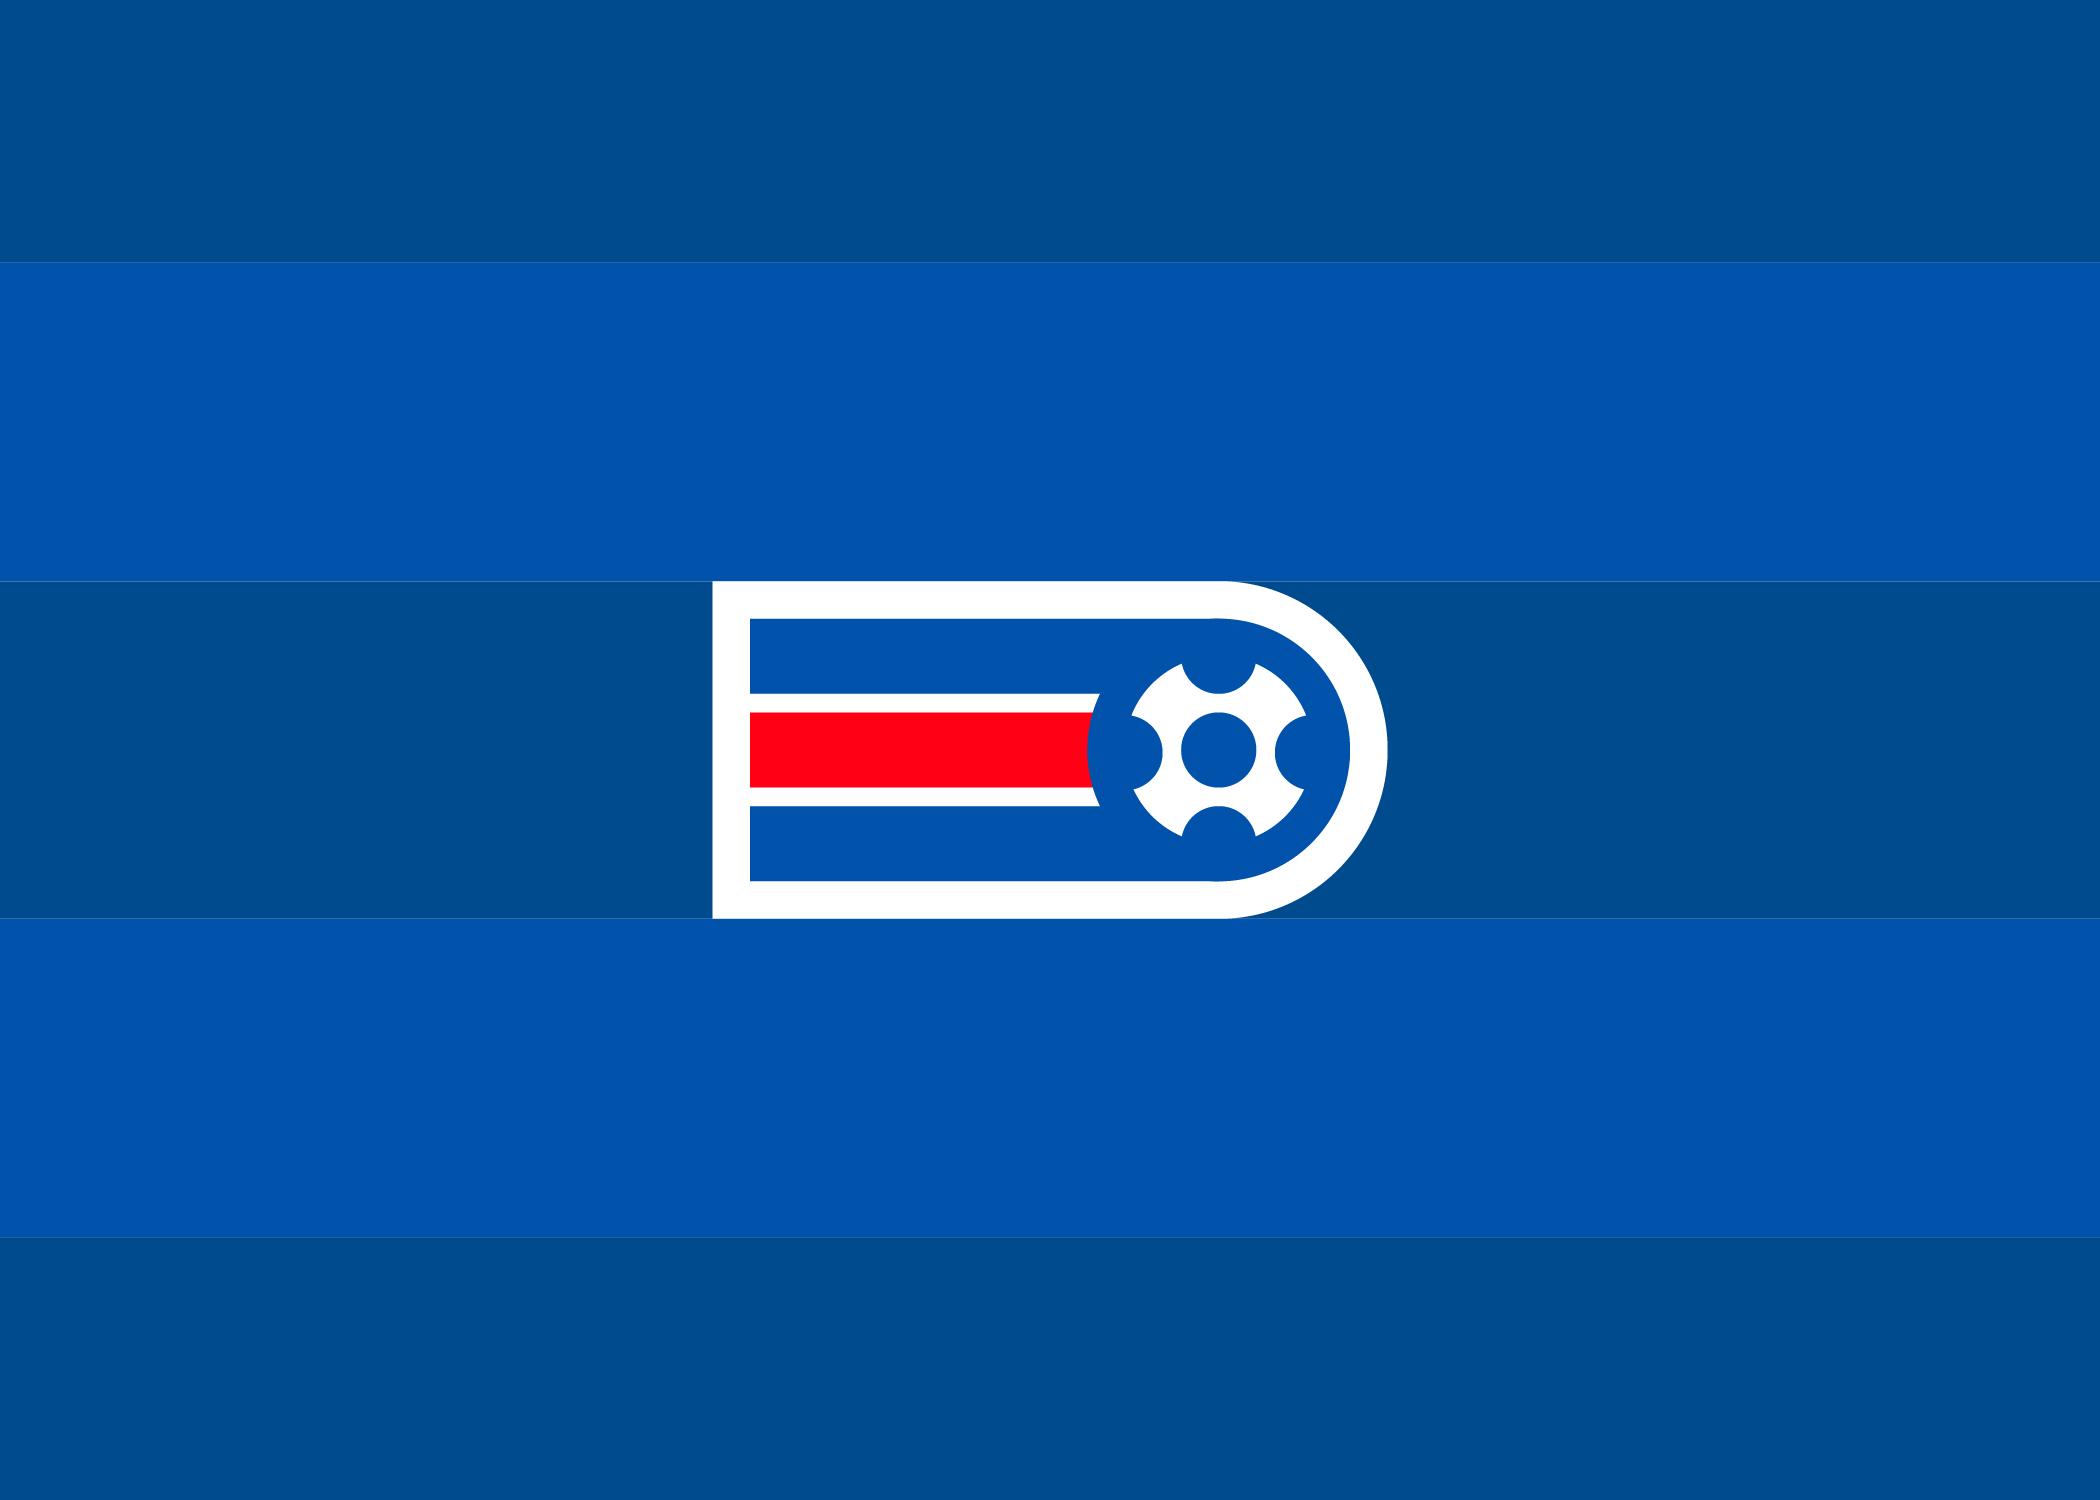 Iceland-Geometric-World-Cup-Football-Badge-01-Logo-Design-Freelance-Kent.png